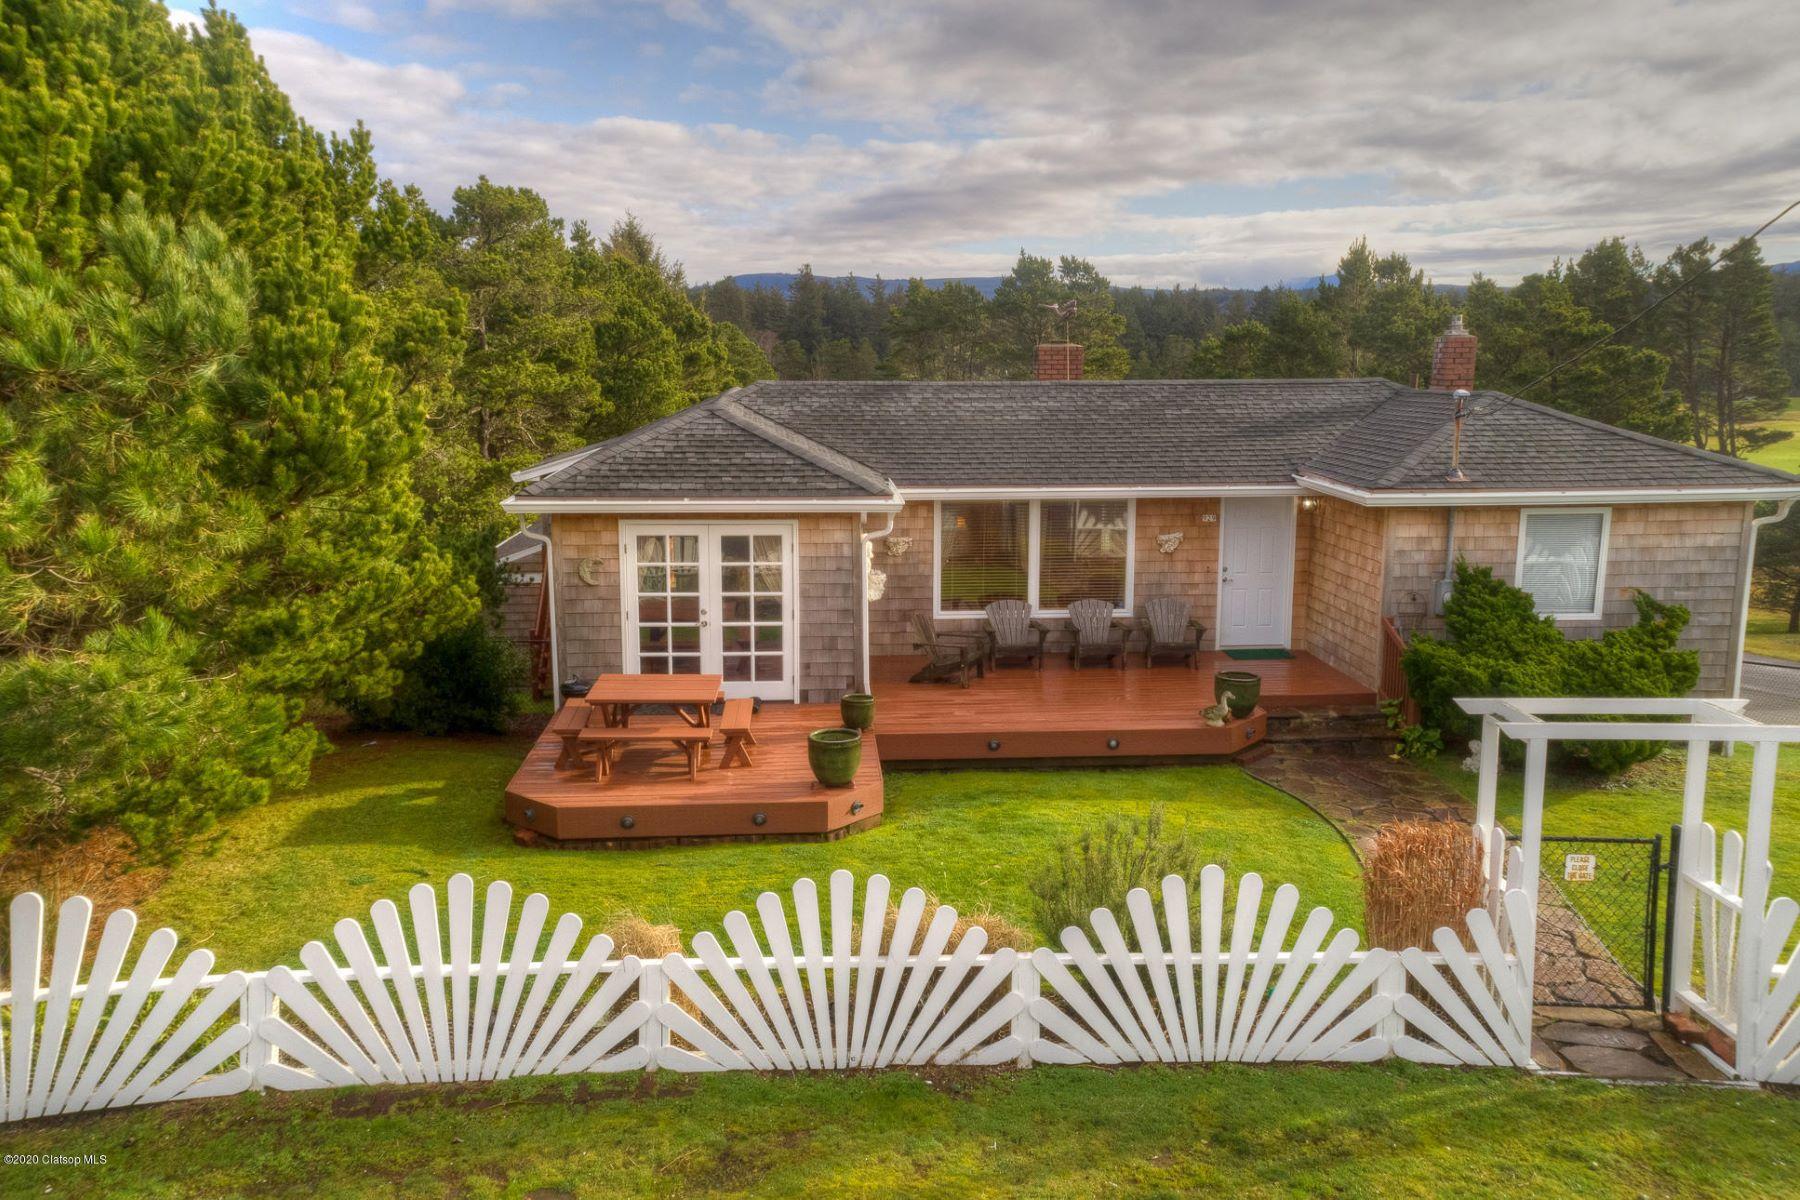 Other Residential Homes για την Πώληση στο 929 Marion Ave Gearhart, OR 97138 Gearhart, Ορεγκον 97138 Ηνωμένες Πολιτείες